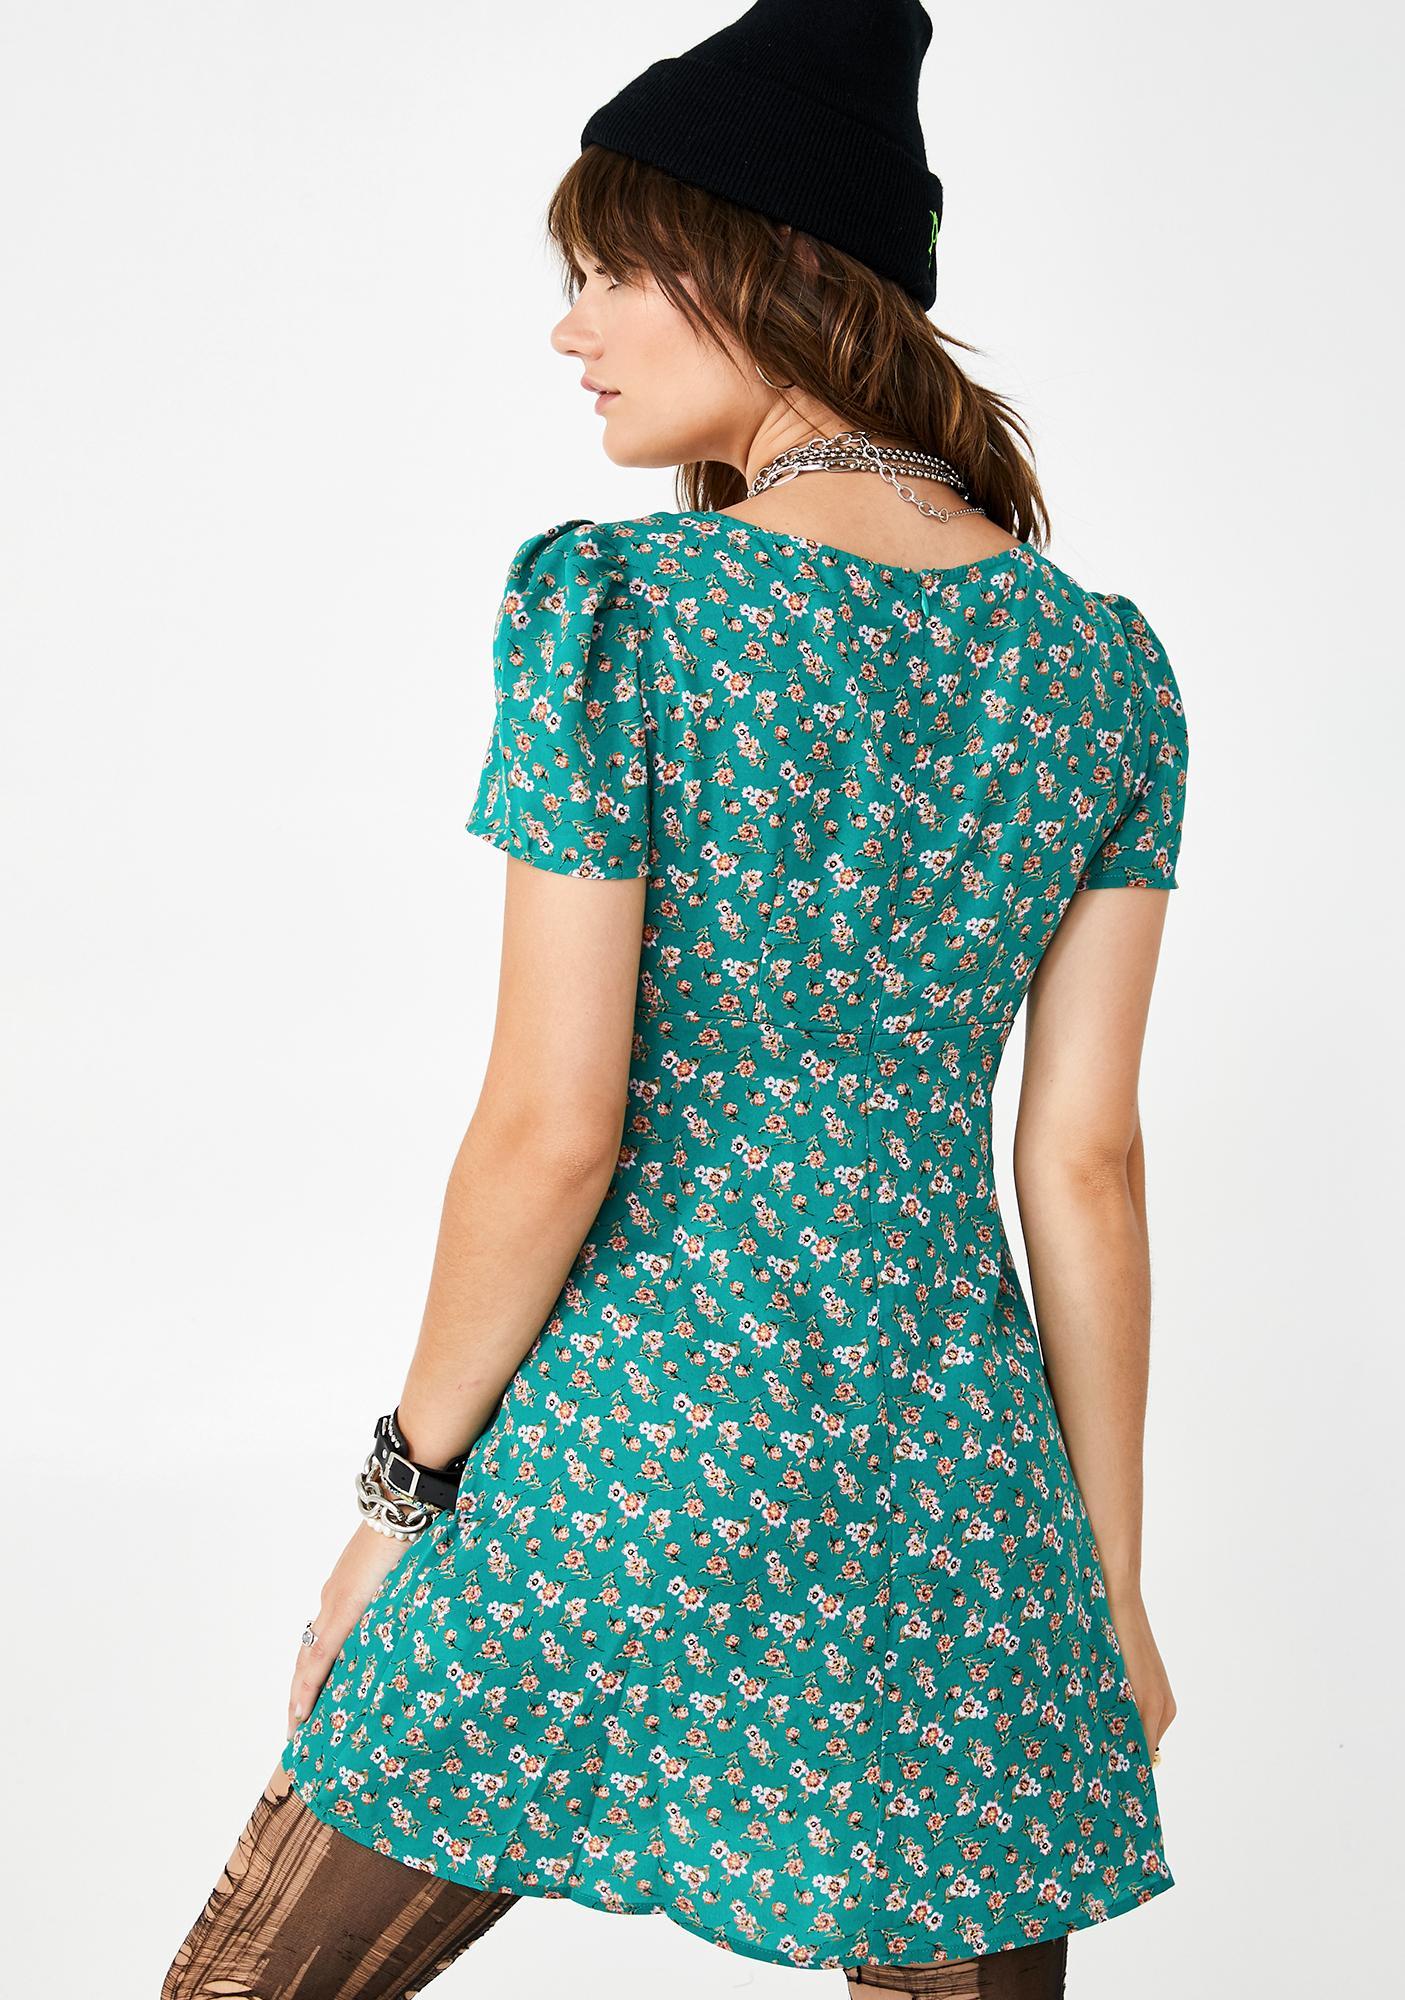 Summer Mayhem Floral Dress